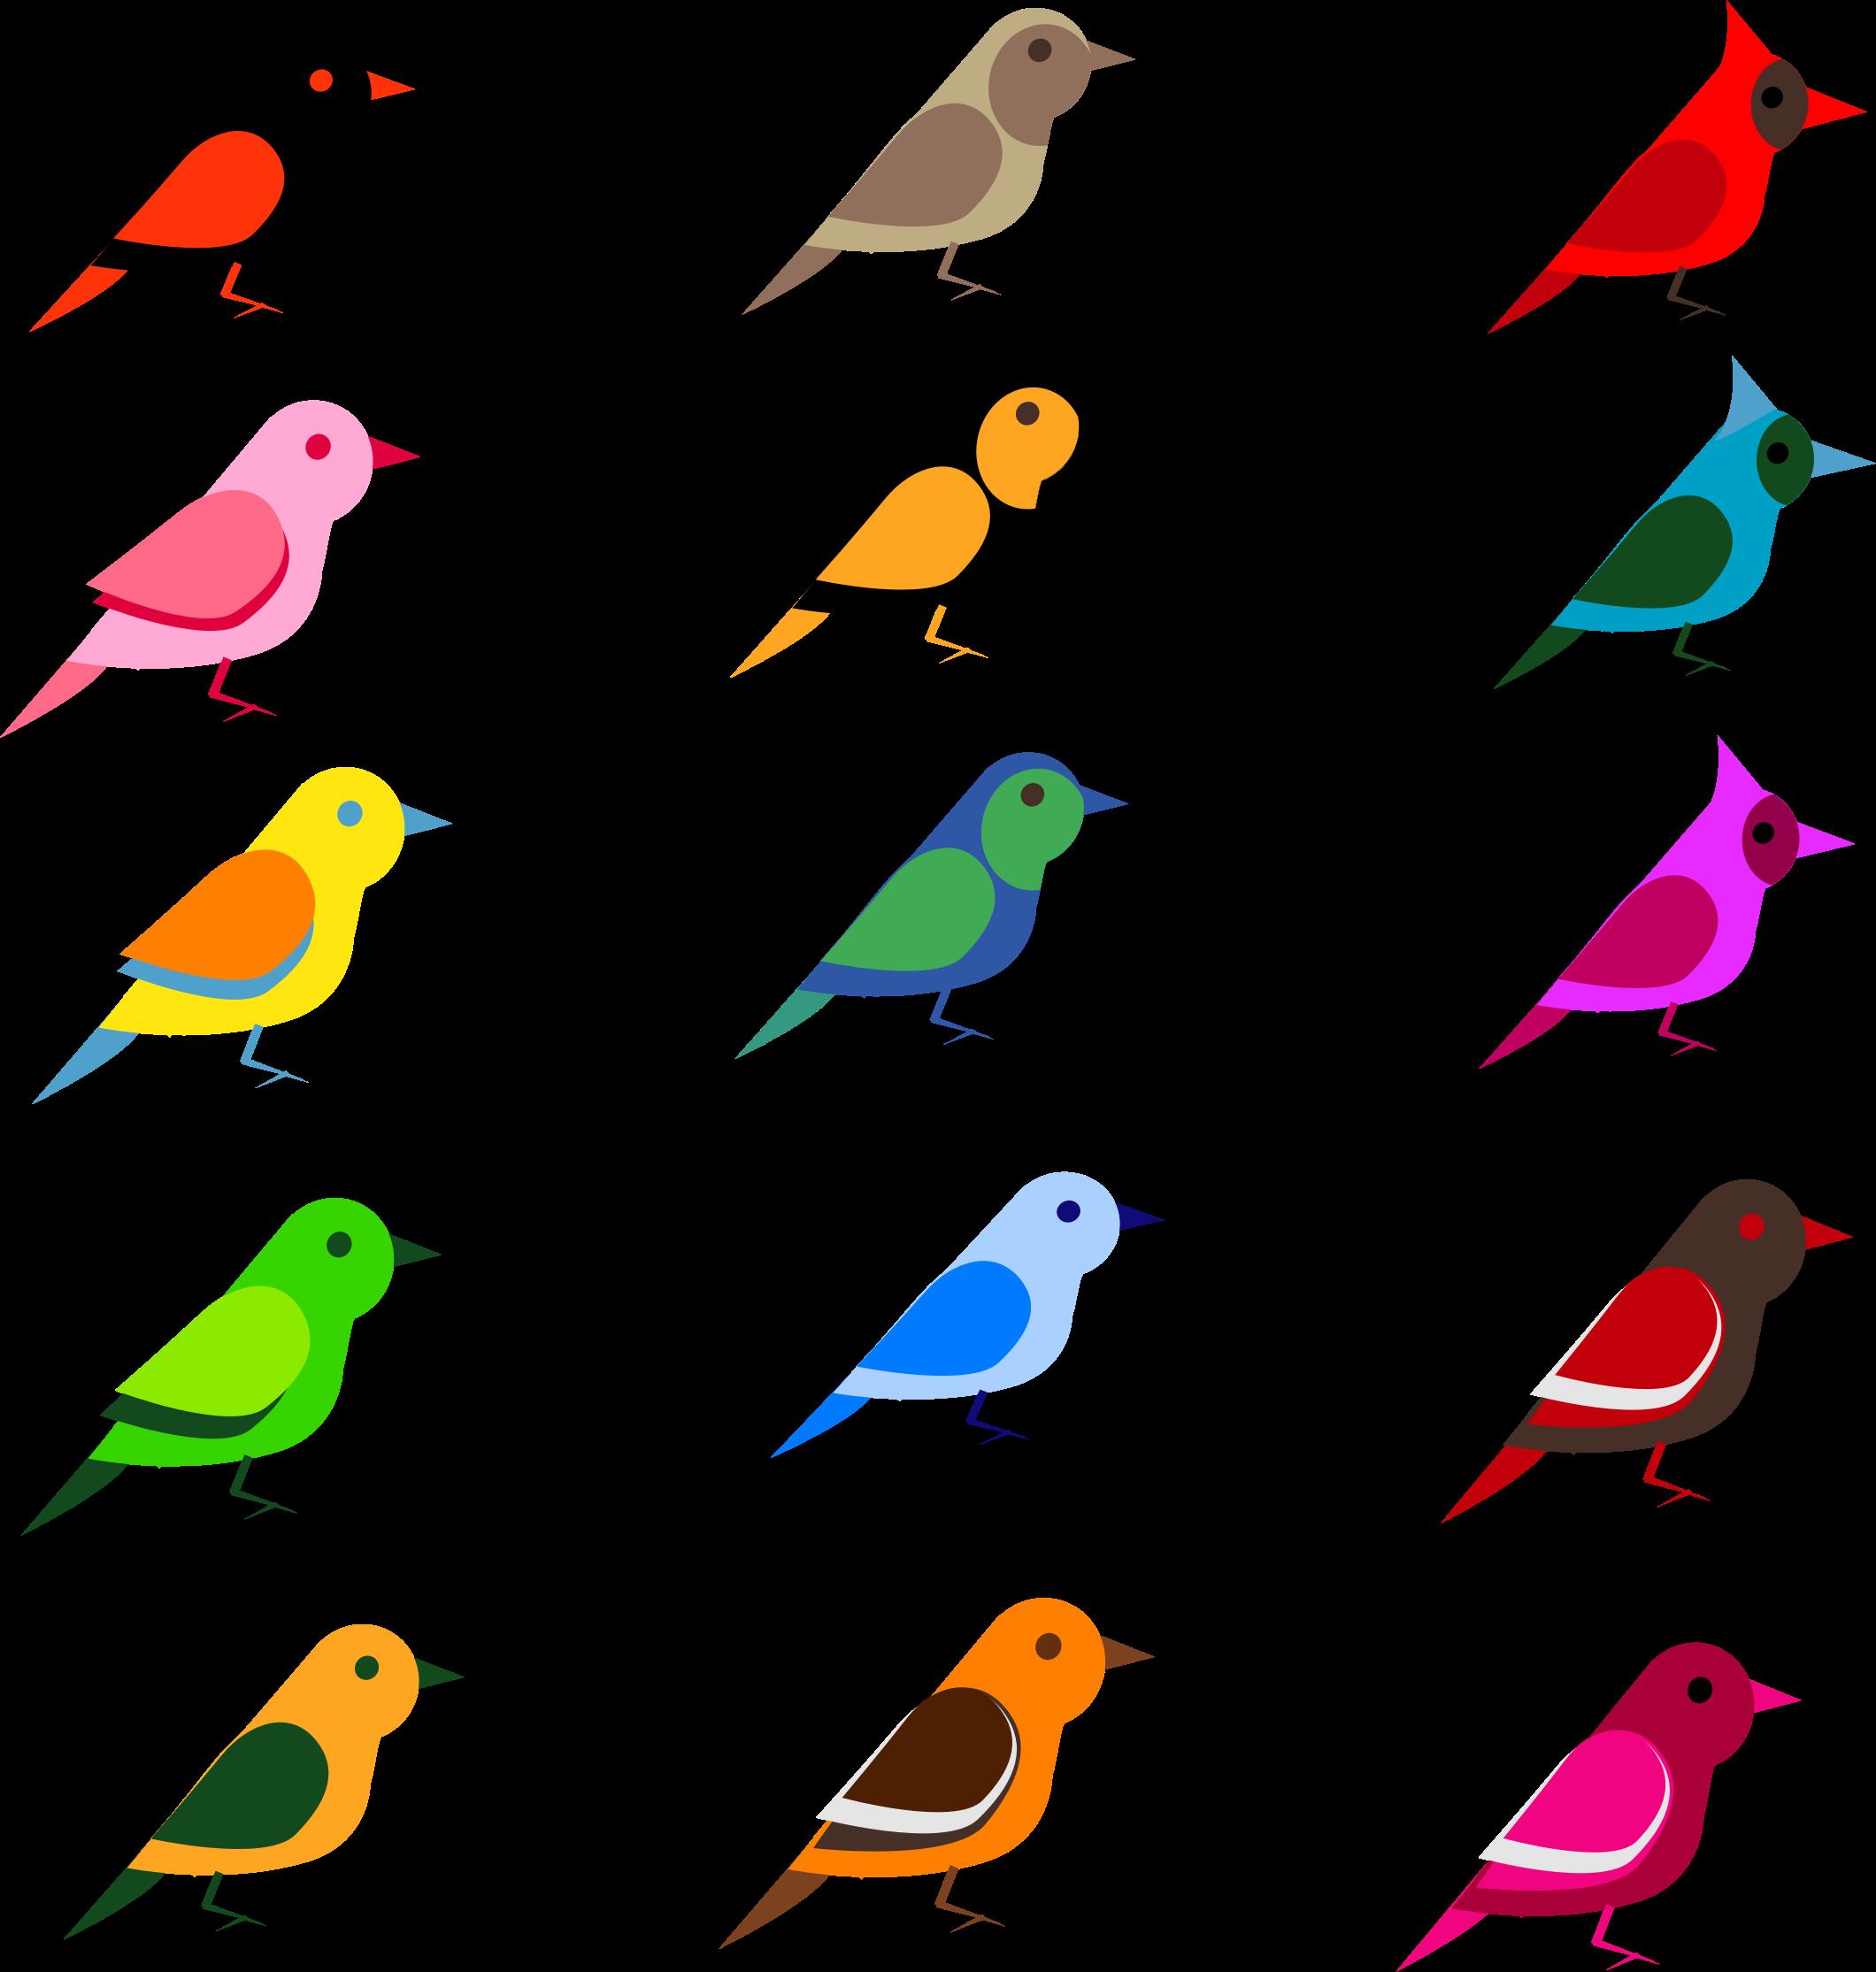 Simple birds by barbie. Lemons clipart lukisan